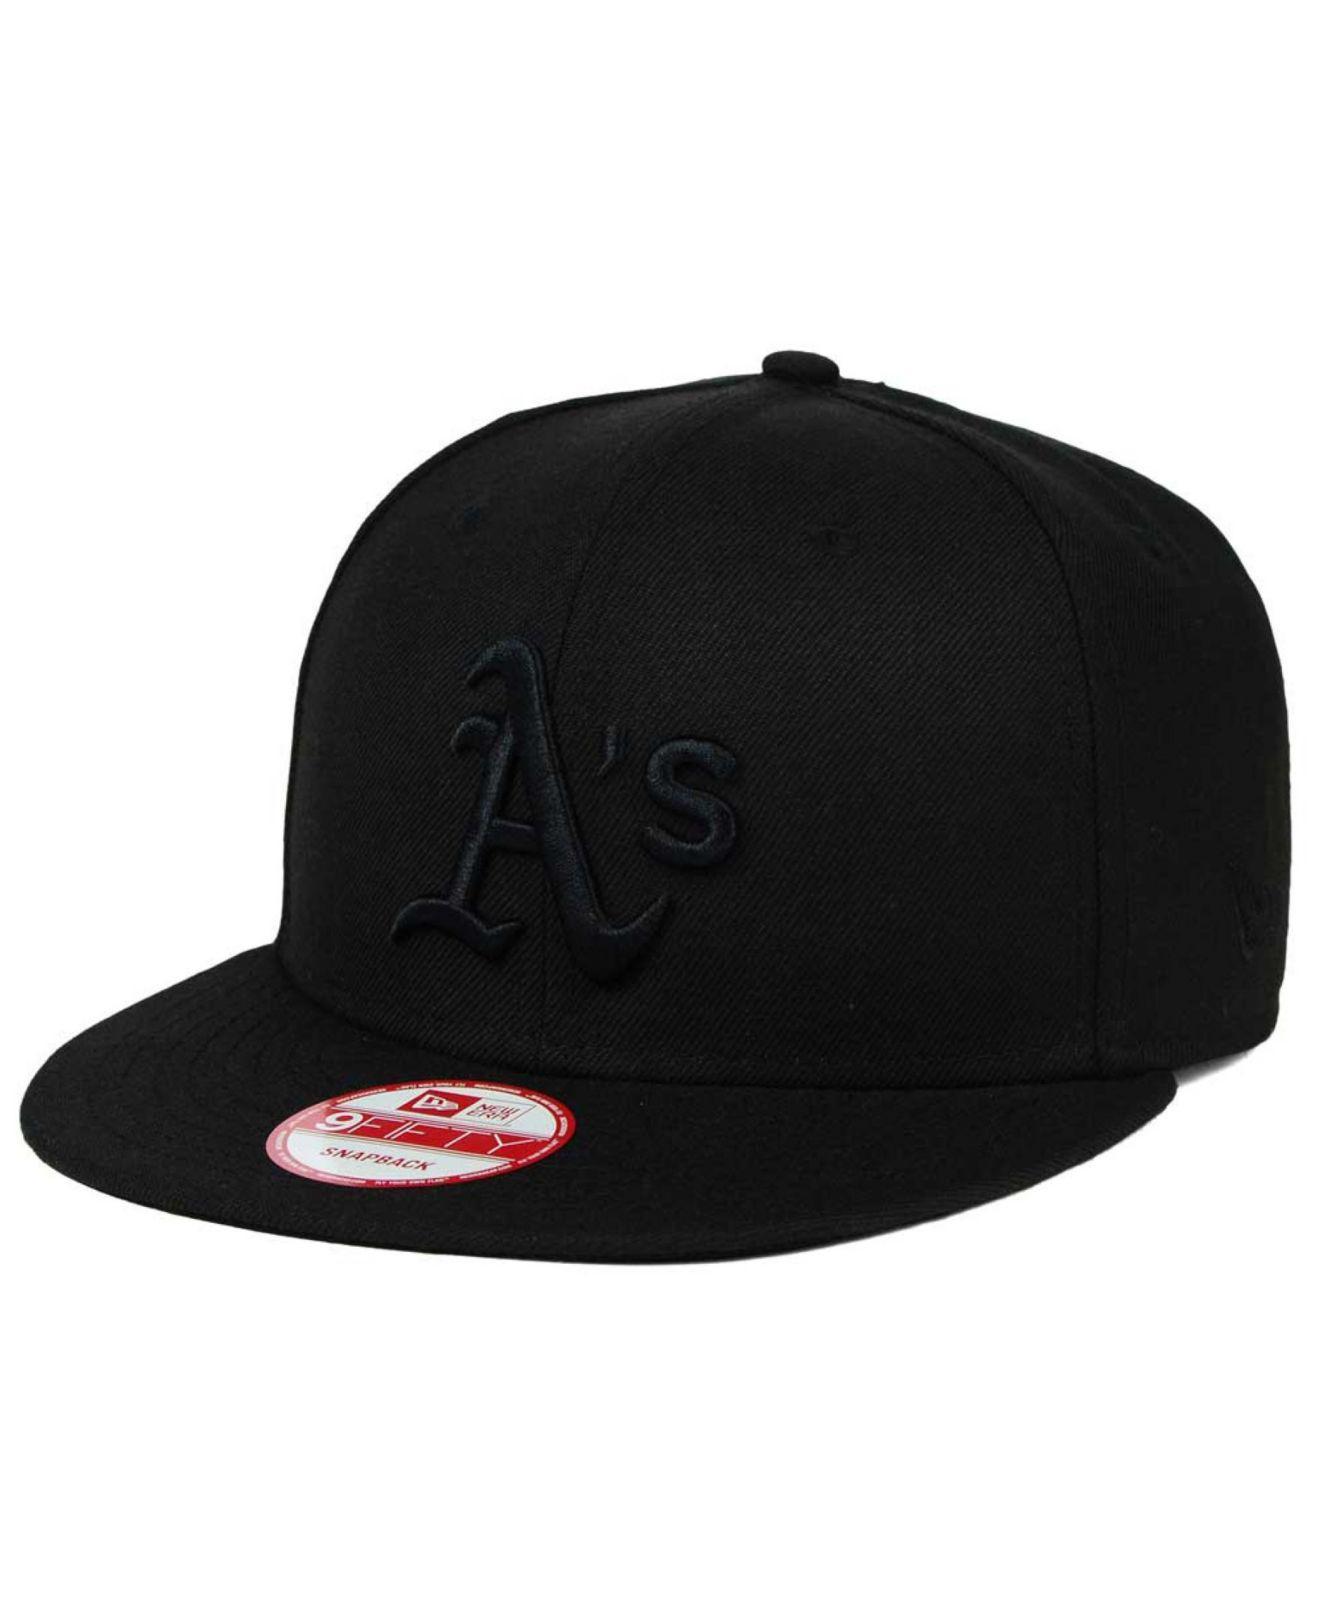 7b310c3fb33 Lyst - KTZ Oakland Athletics Black On Black 9fifty Snapback Cap in ...